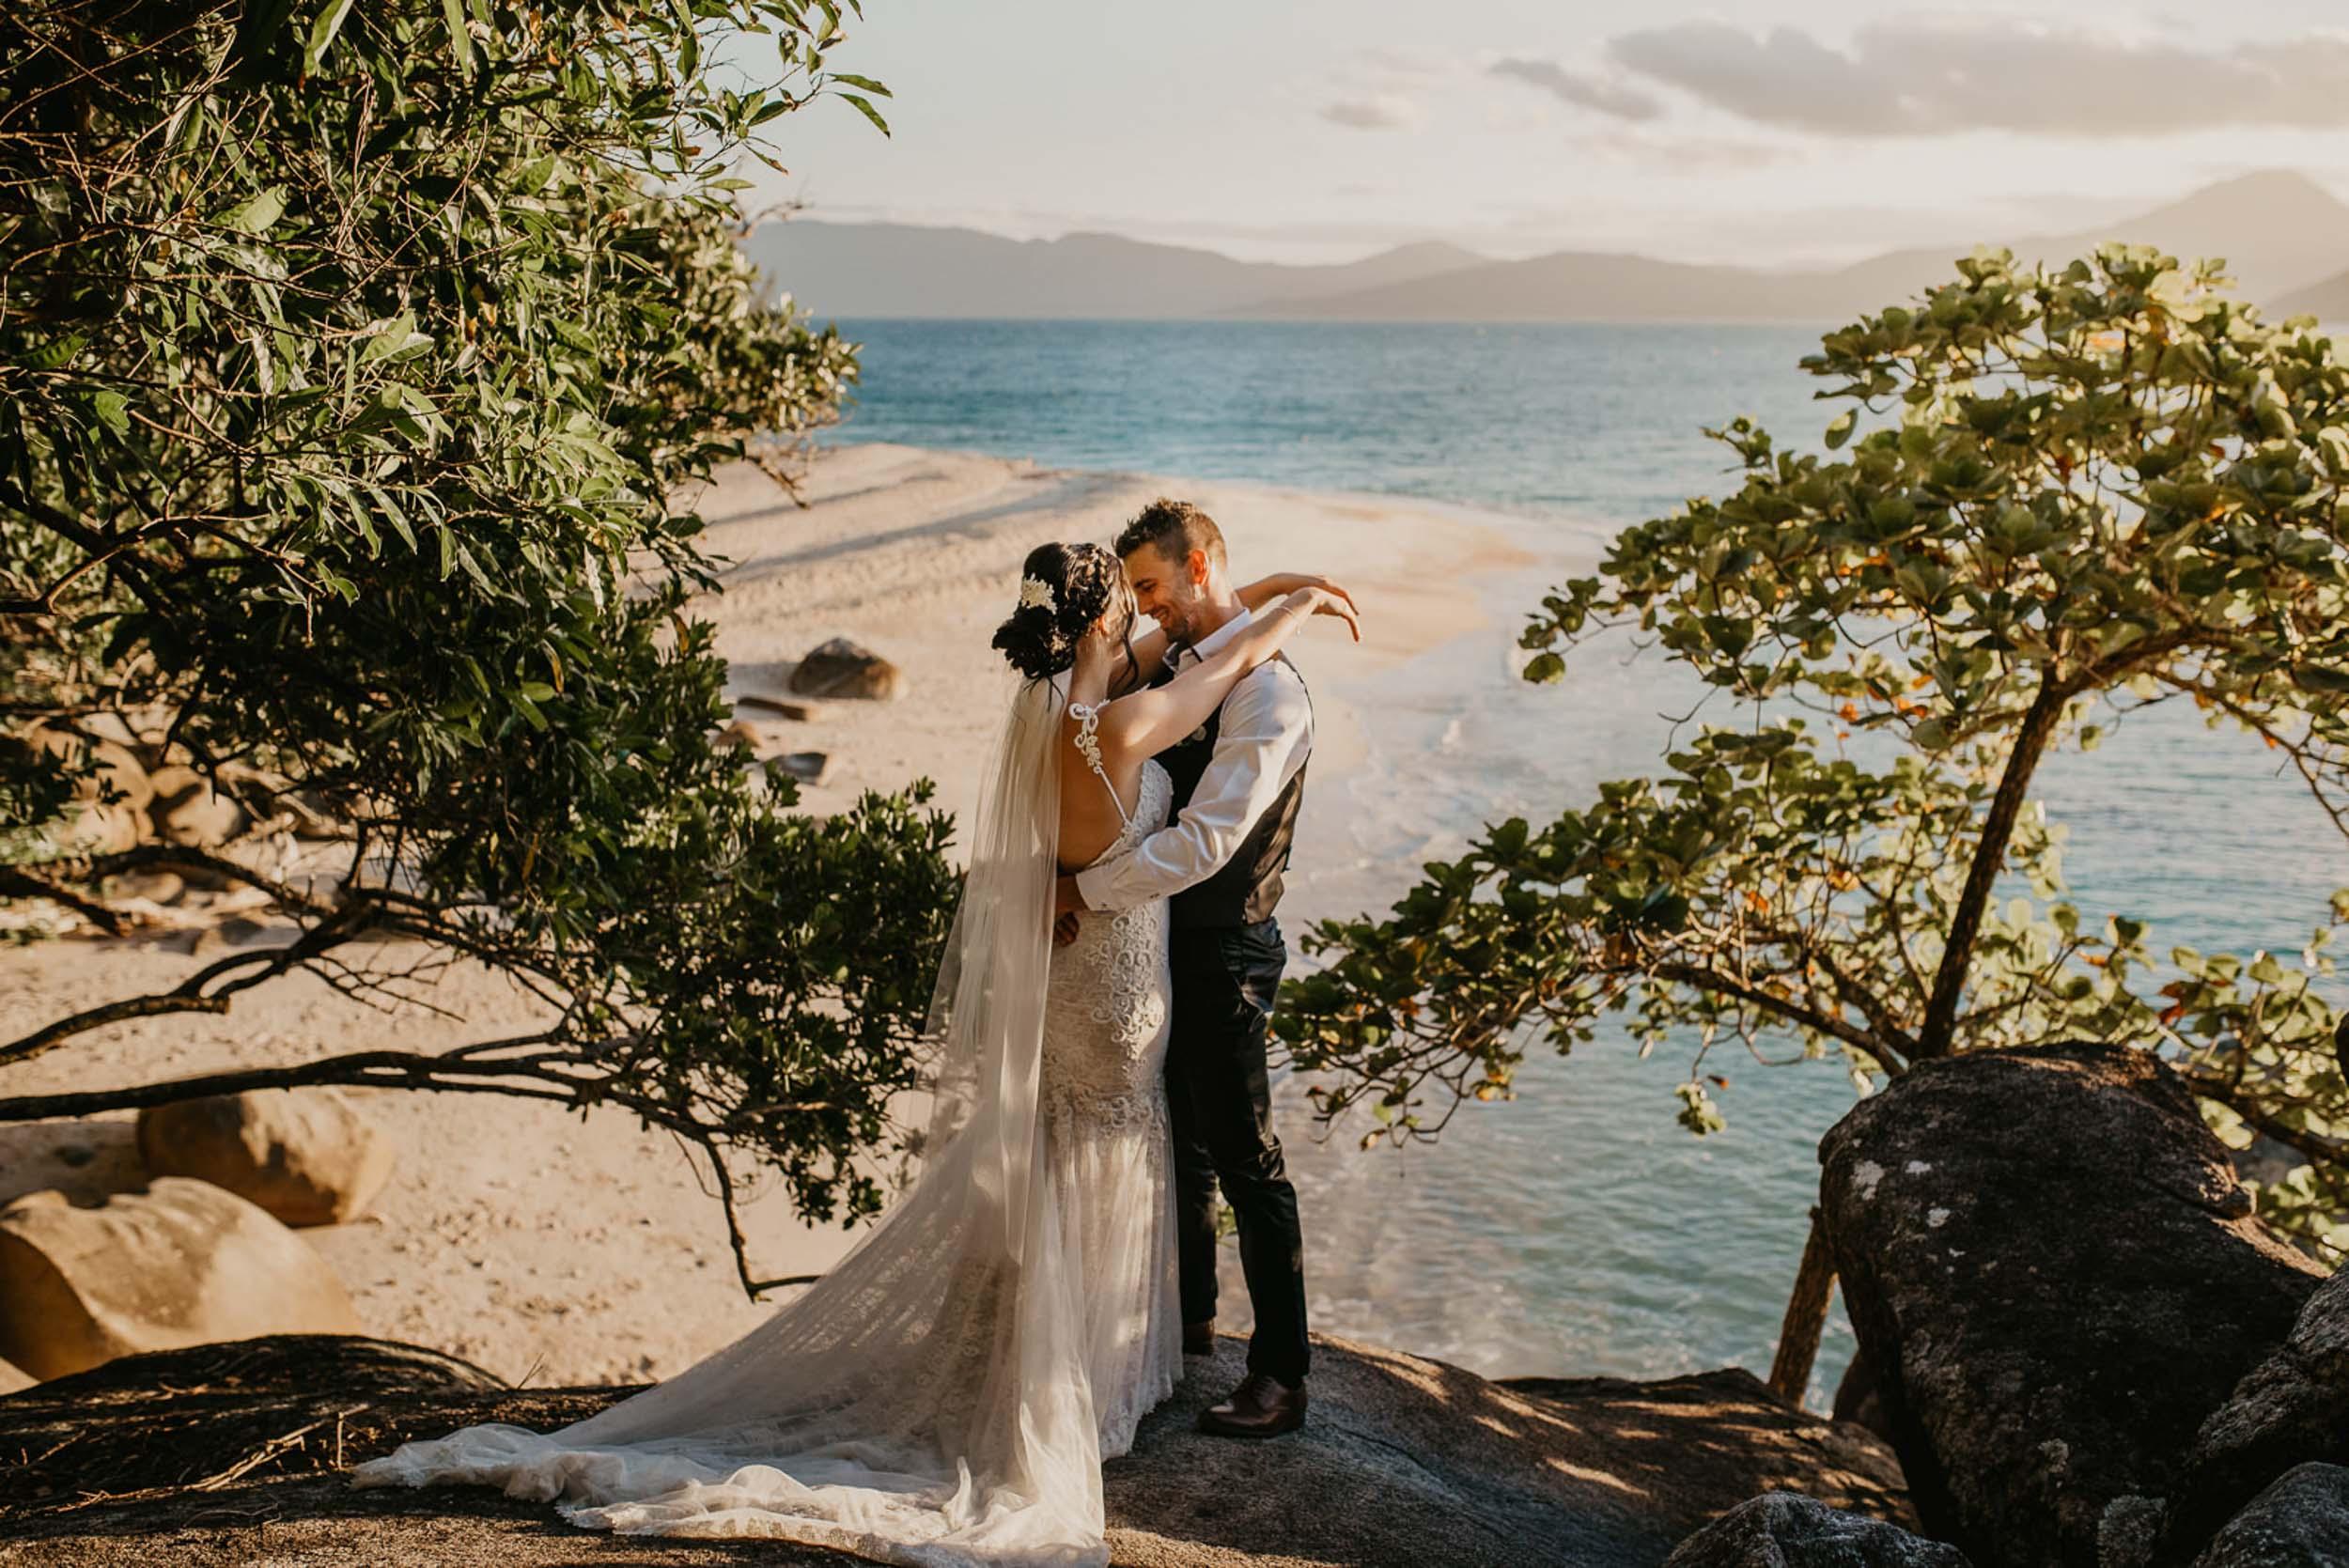 The Raw Photographer - Cairns Wedding Photographer - Fitzroy Island - Destination Wedding - Bride Dress - Groom Portrait - Queensland-33.jpg